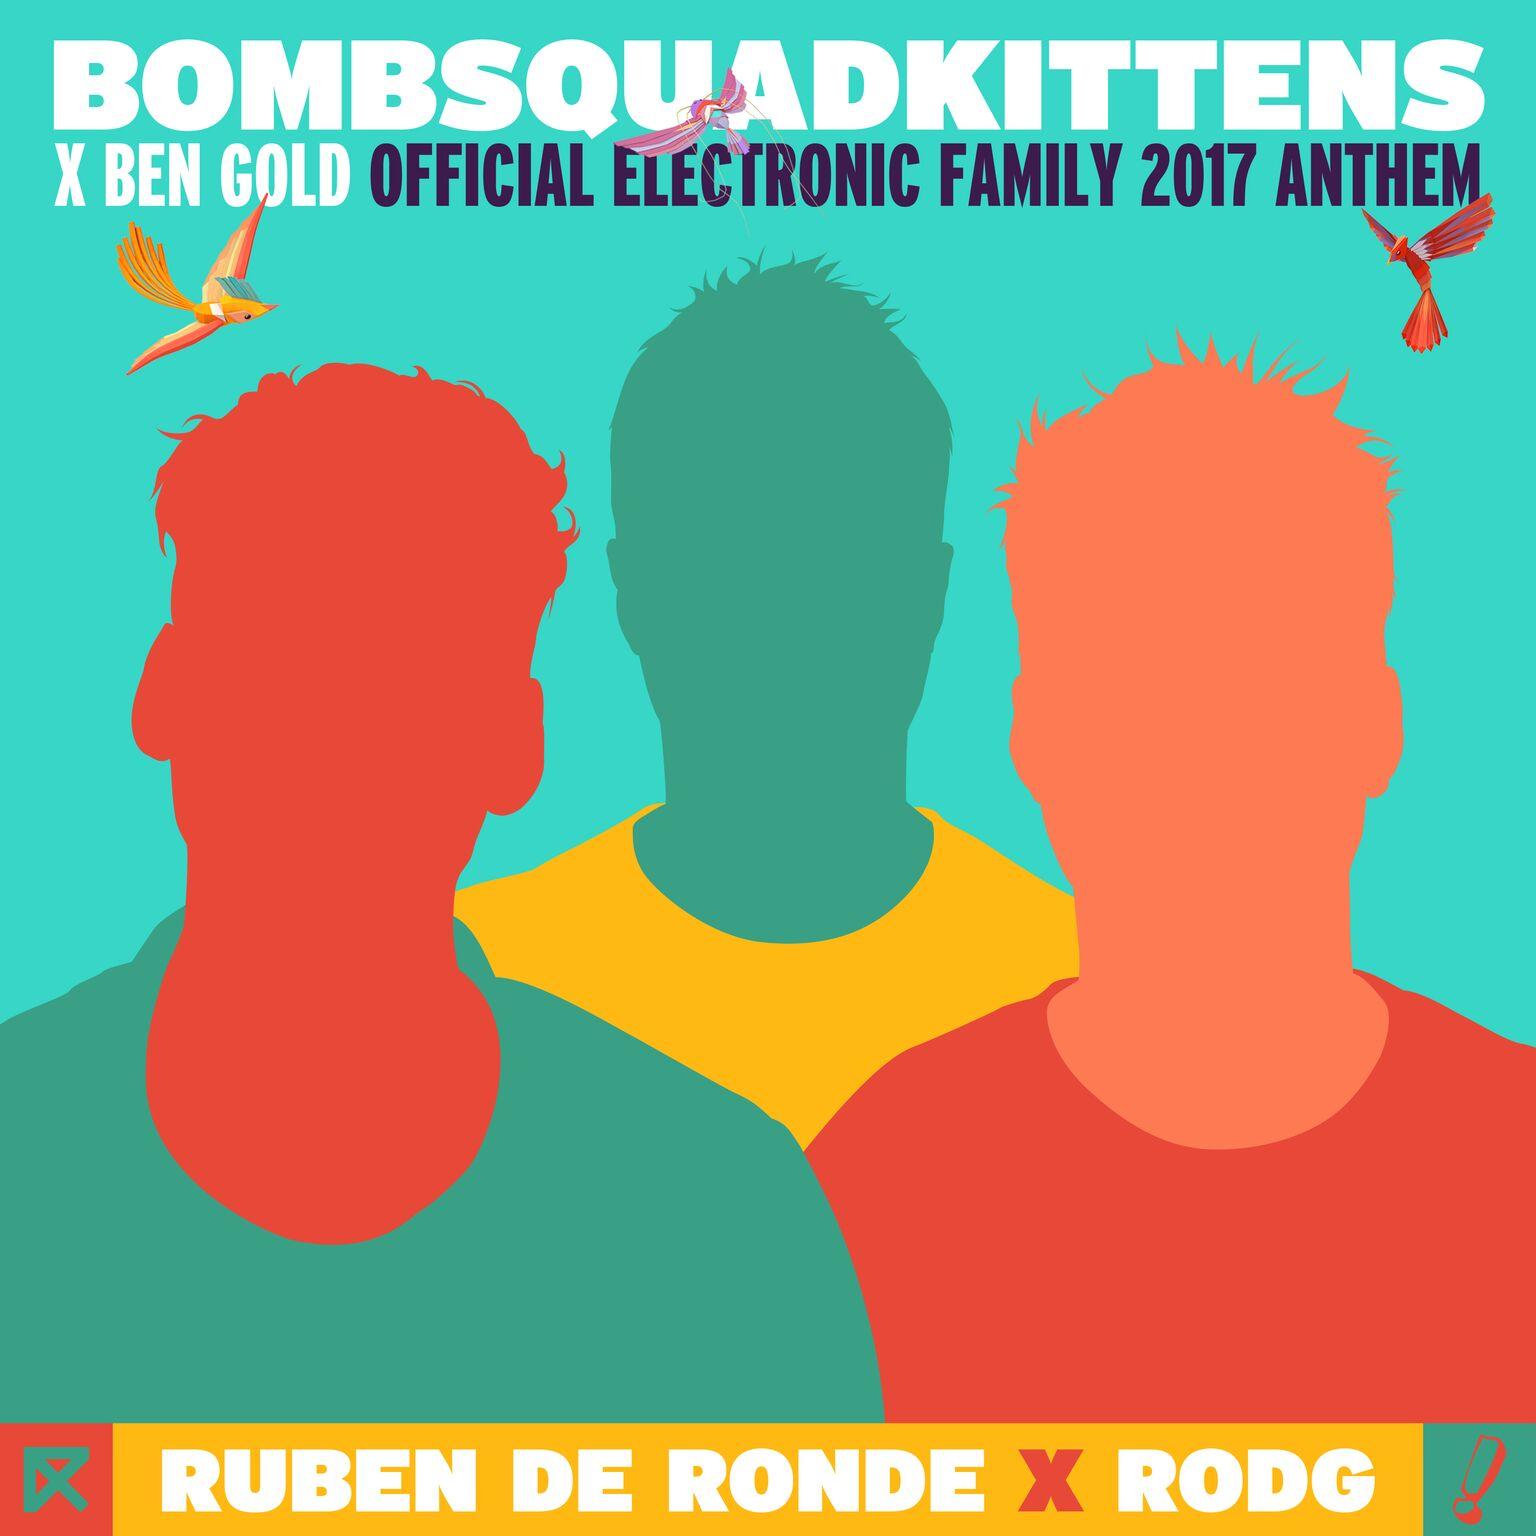 Electronic Family 2017 Anthem: Ruben de Ronde & Rodg & Ben Gold - BombSquadKittens